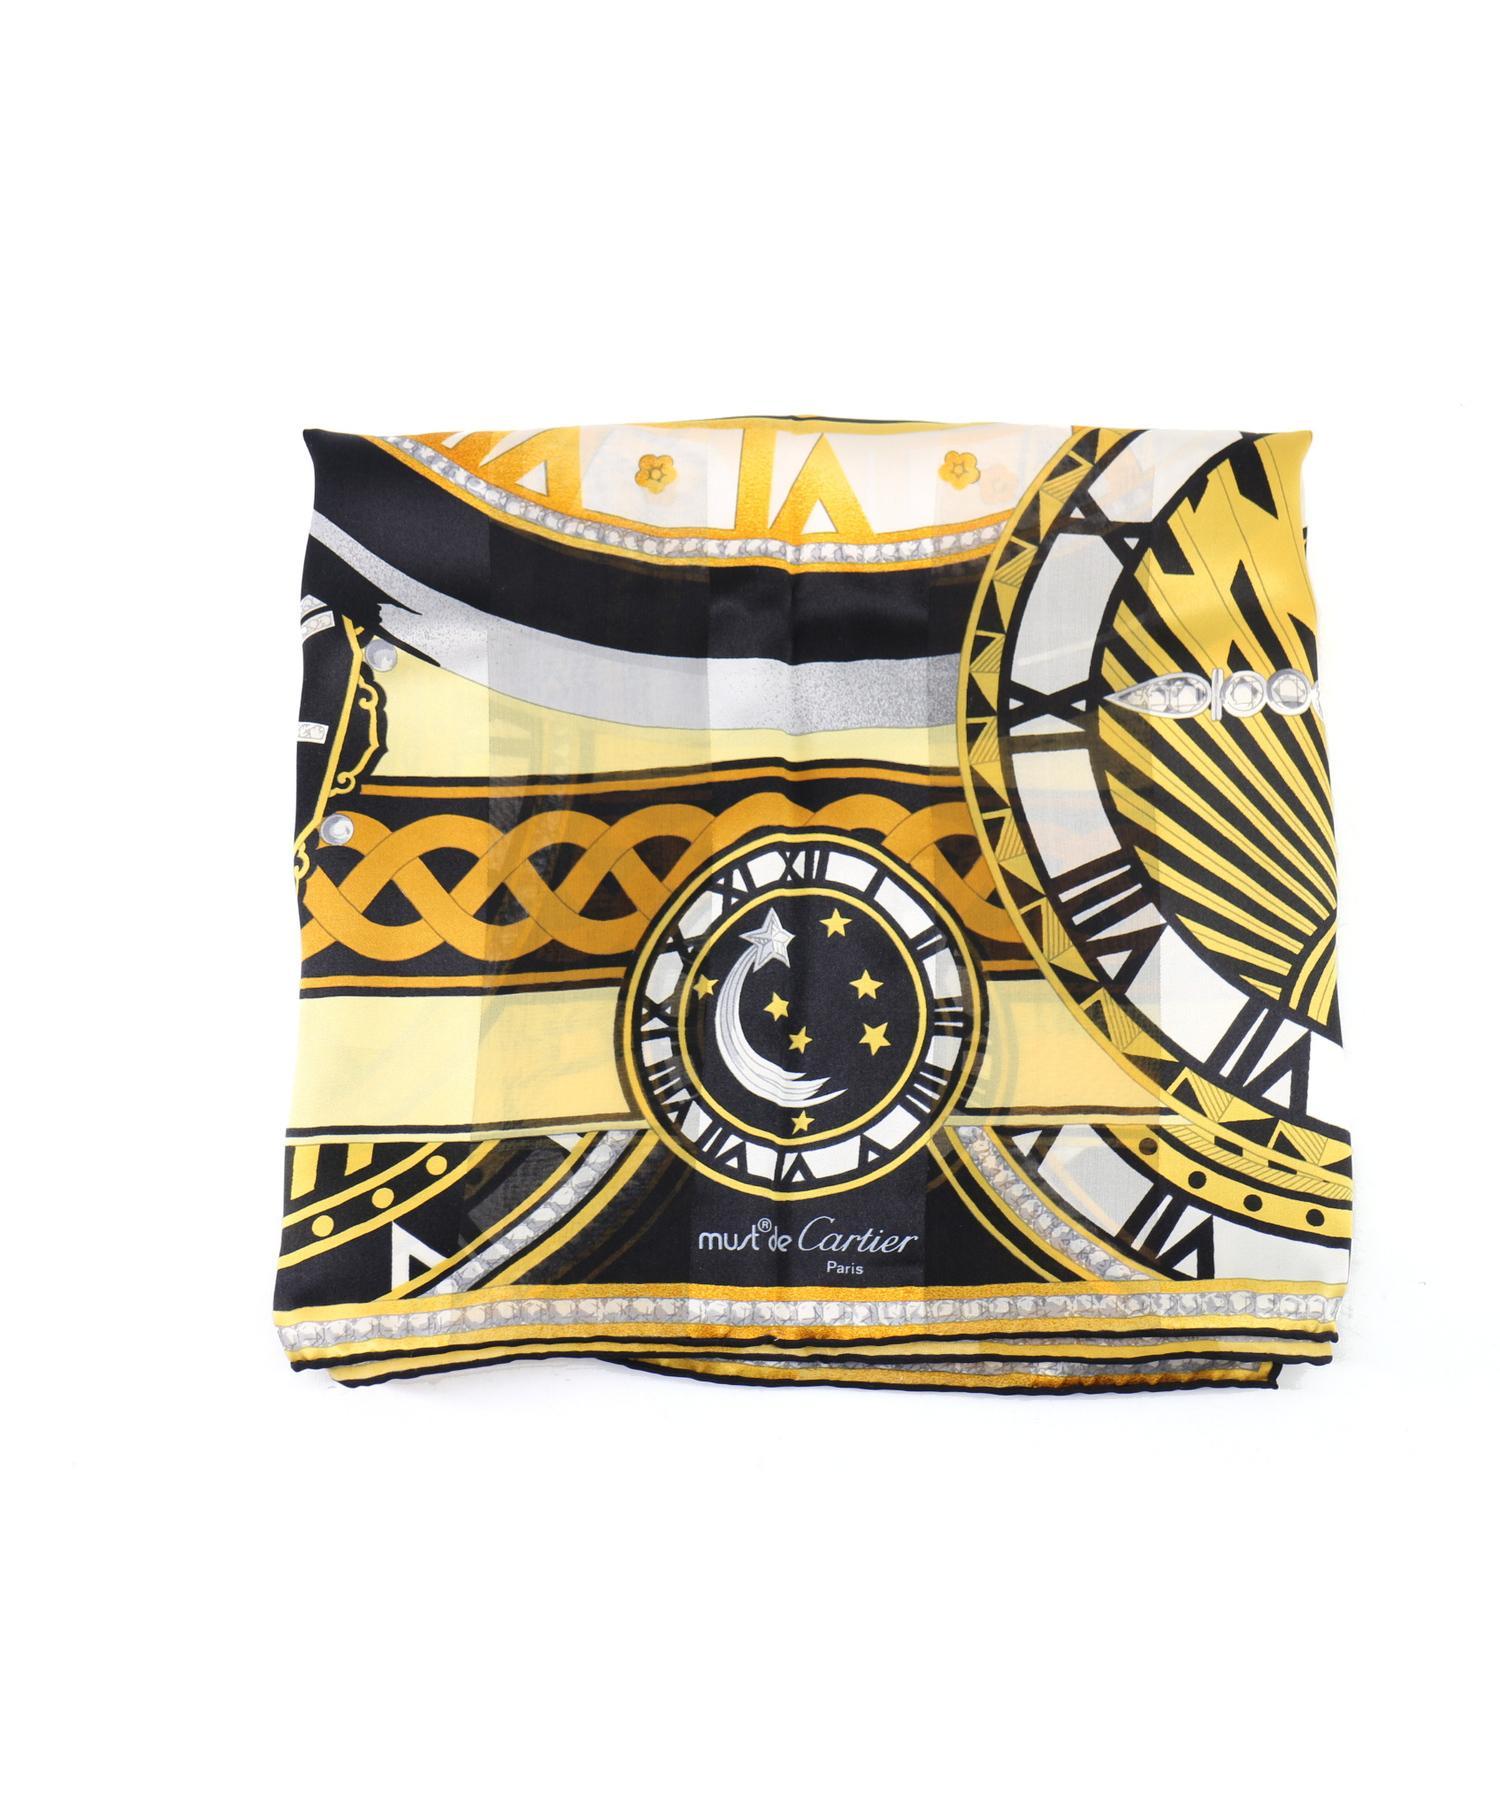 eb4ce571234e 中古・古着通販】Cartier (カルティエ) スカーフ ゴールド フランス製 ...